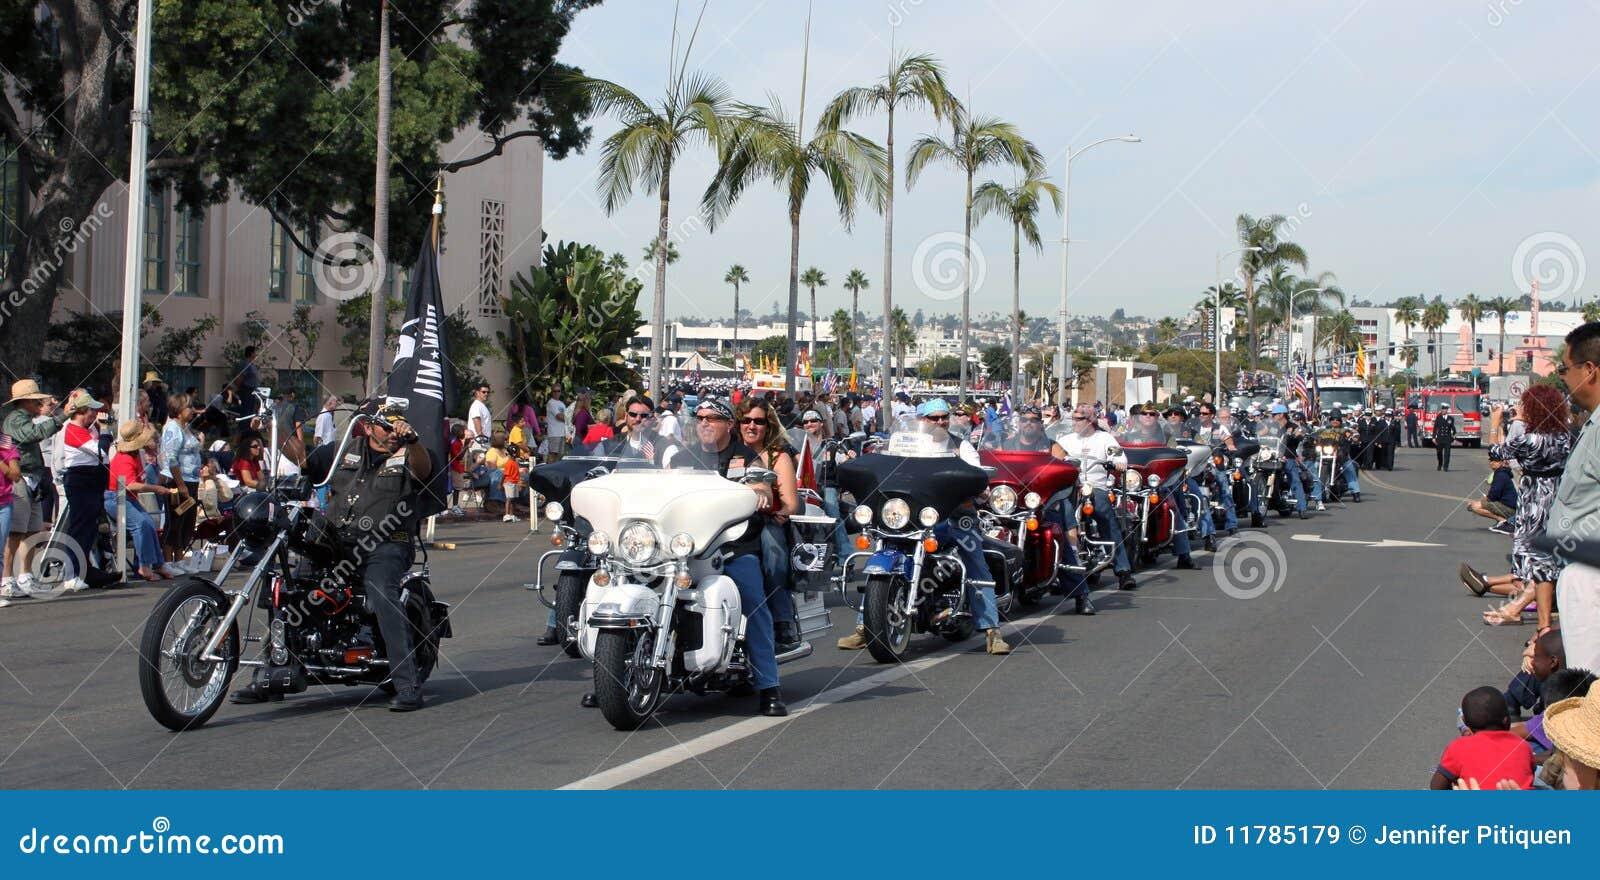 Harley davidson motorcycle riders editorial stock image image of harley davidson motorcycle riders kristyandbryce Image collections